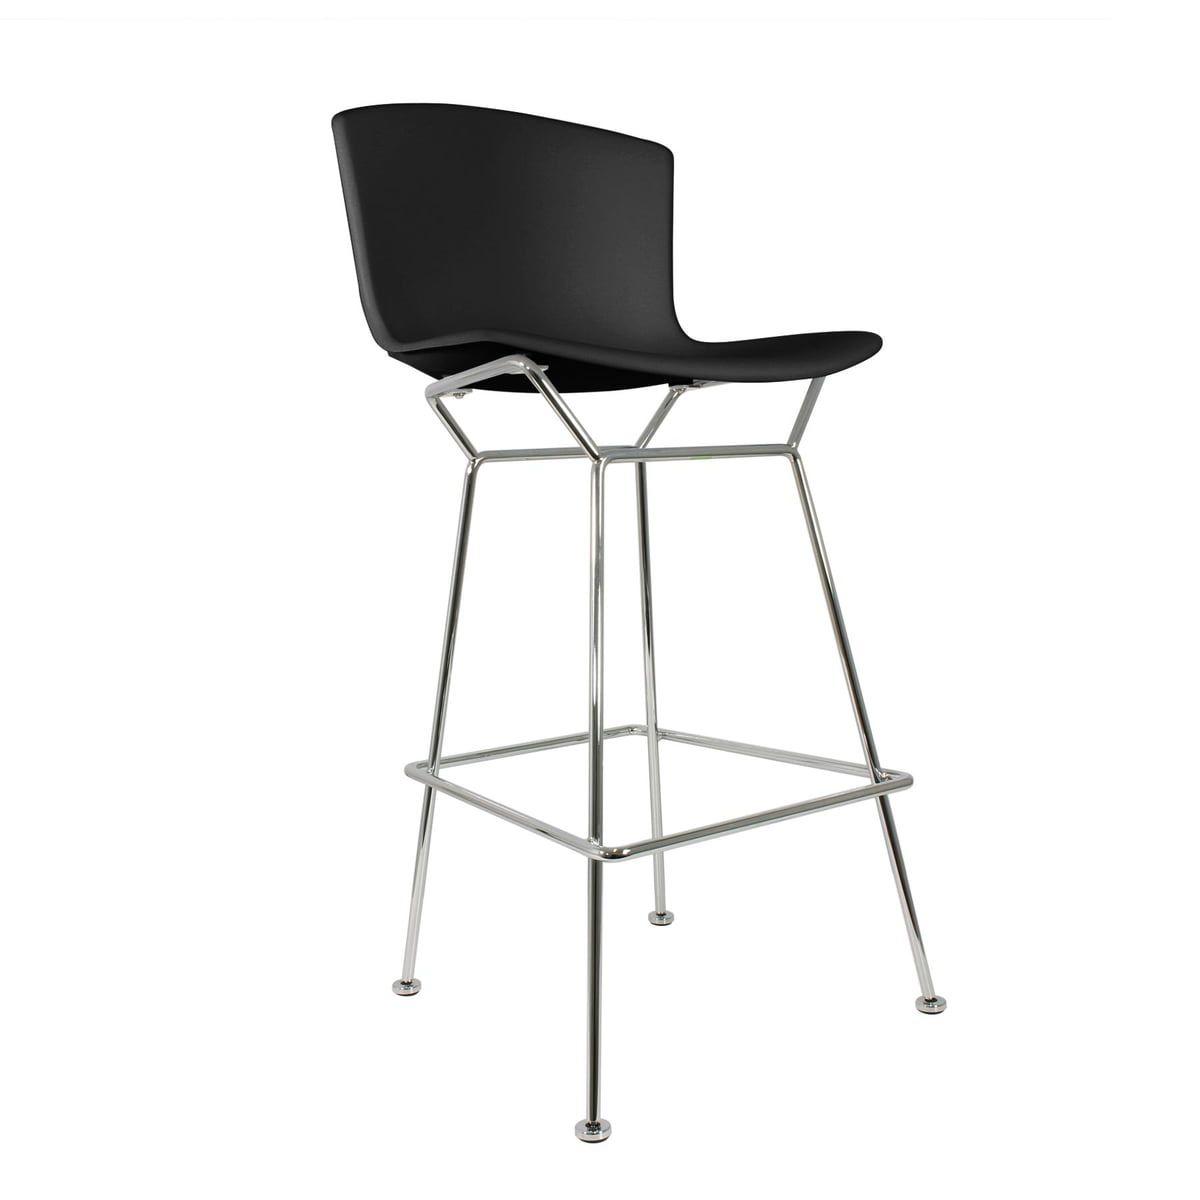 2019 wohndesign  knoll bertoia bar stool  modern furniture cheap check more at